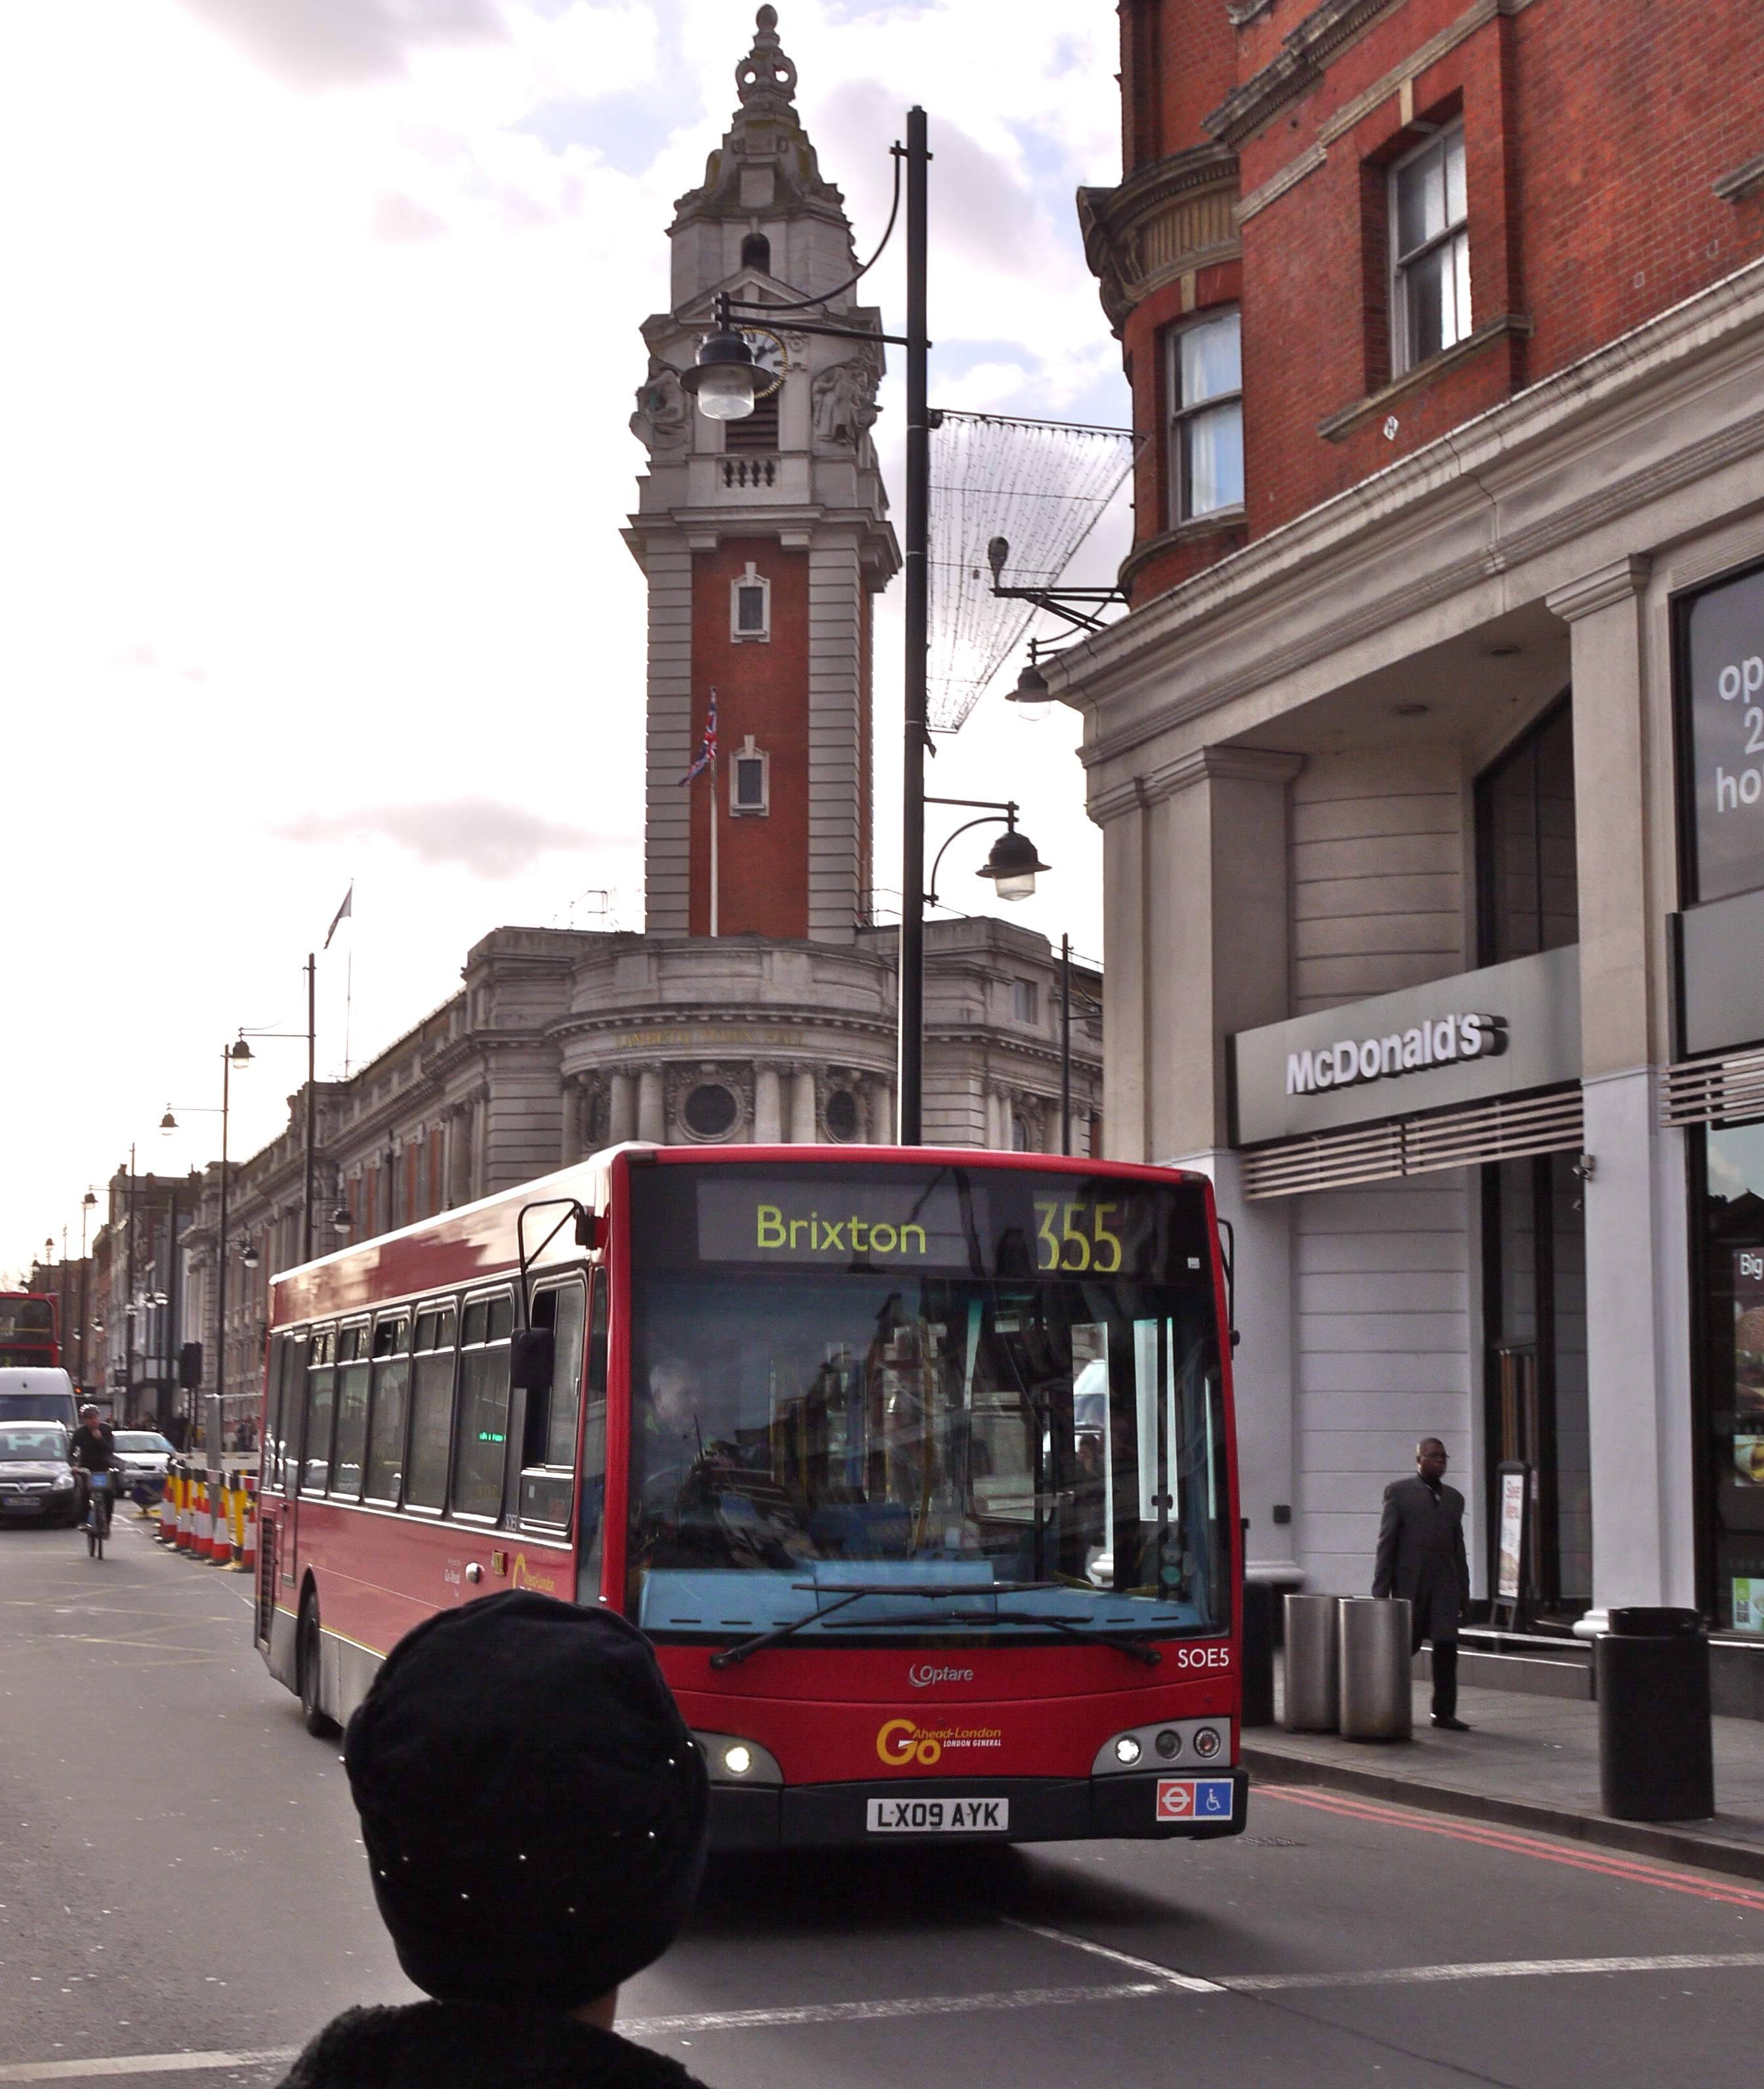 Brixton traffic